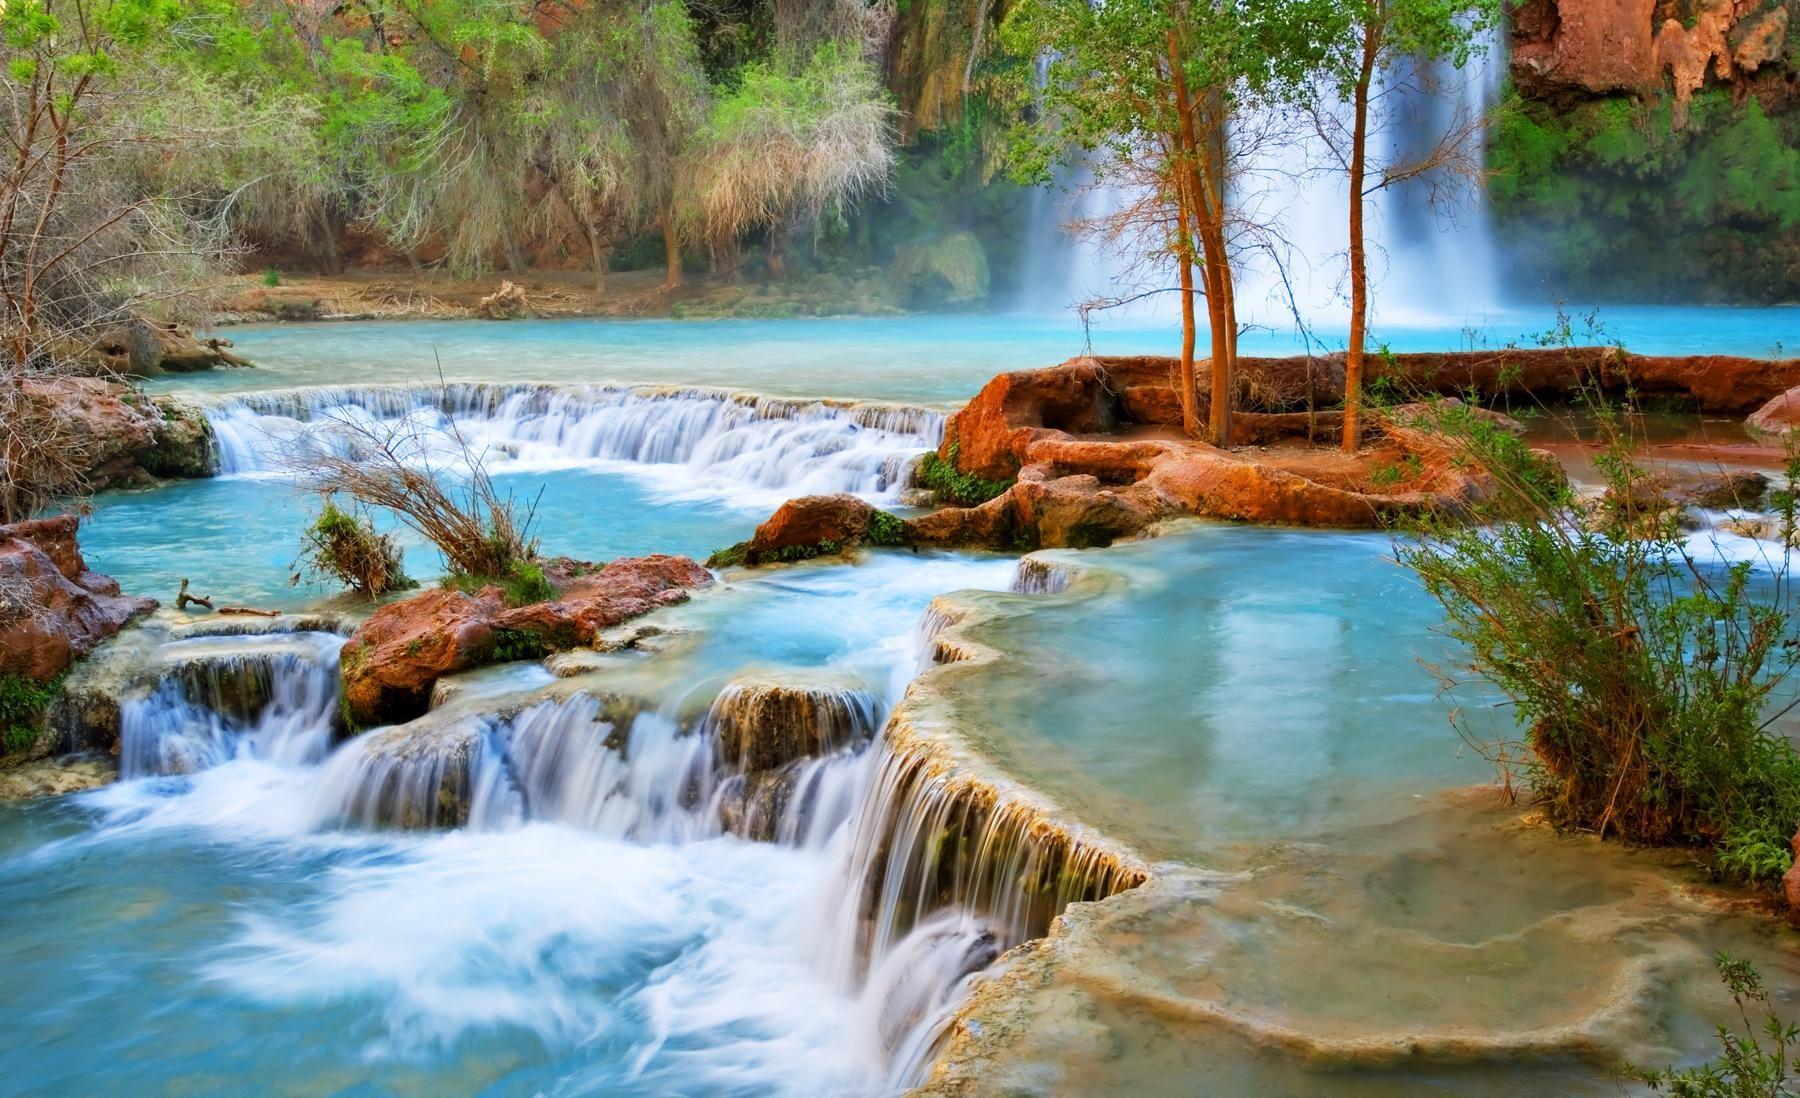 havasu falls arizona - (#164449) - high quality and resolution